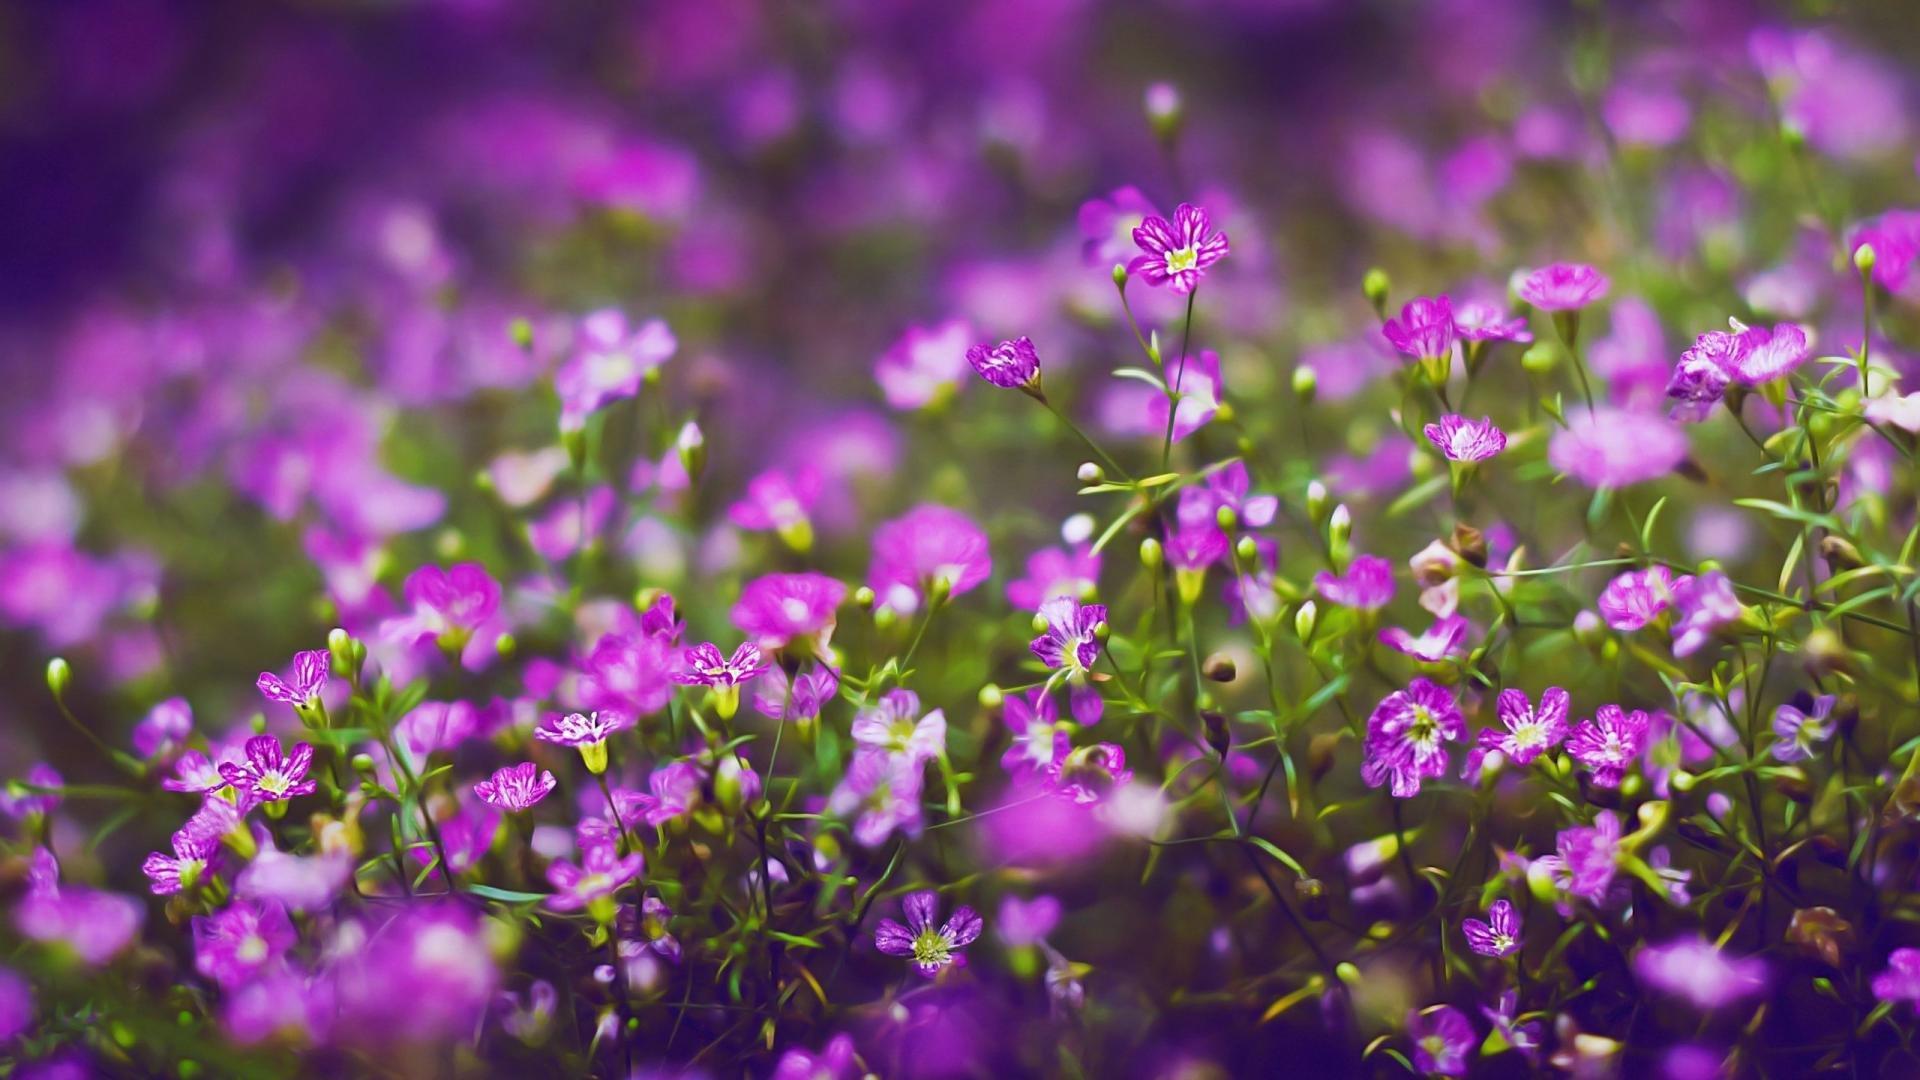 Flowers Desktop Background Hd 1920x1080 Wallpaper Teahub Io